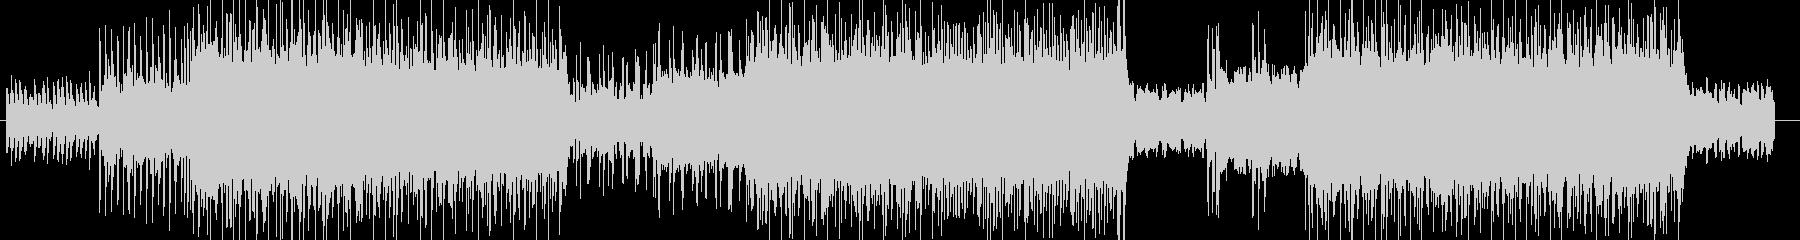 ROCK「DARK/ホラー」BGM285の未再生の波形